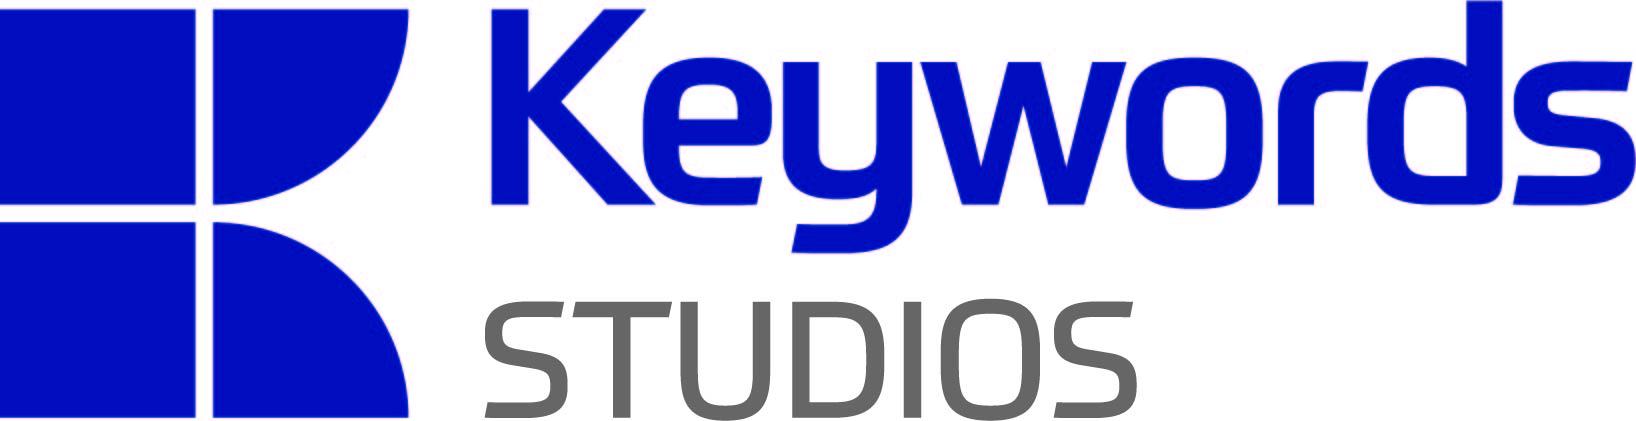 Keywords_logo.jpg